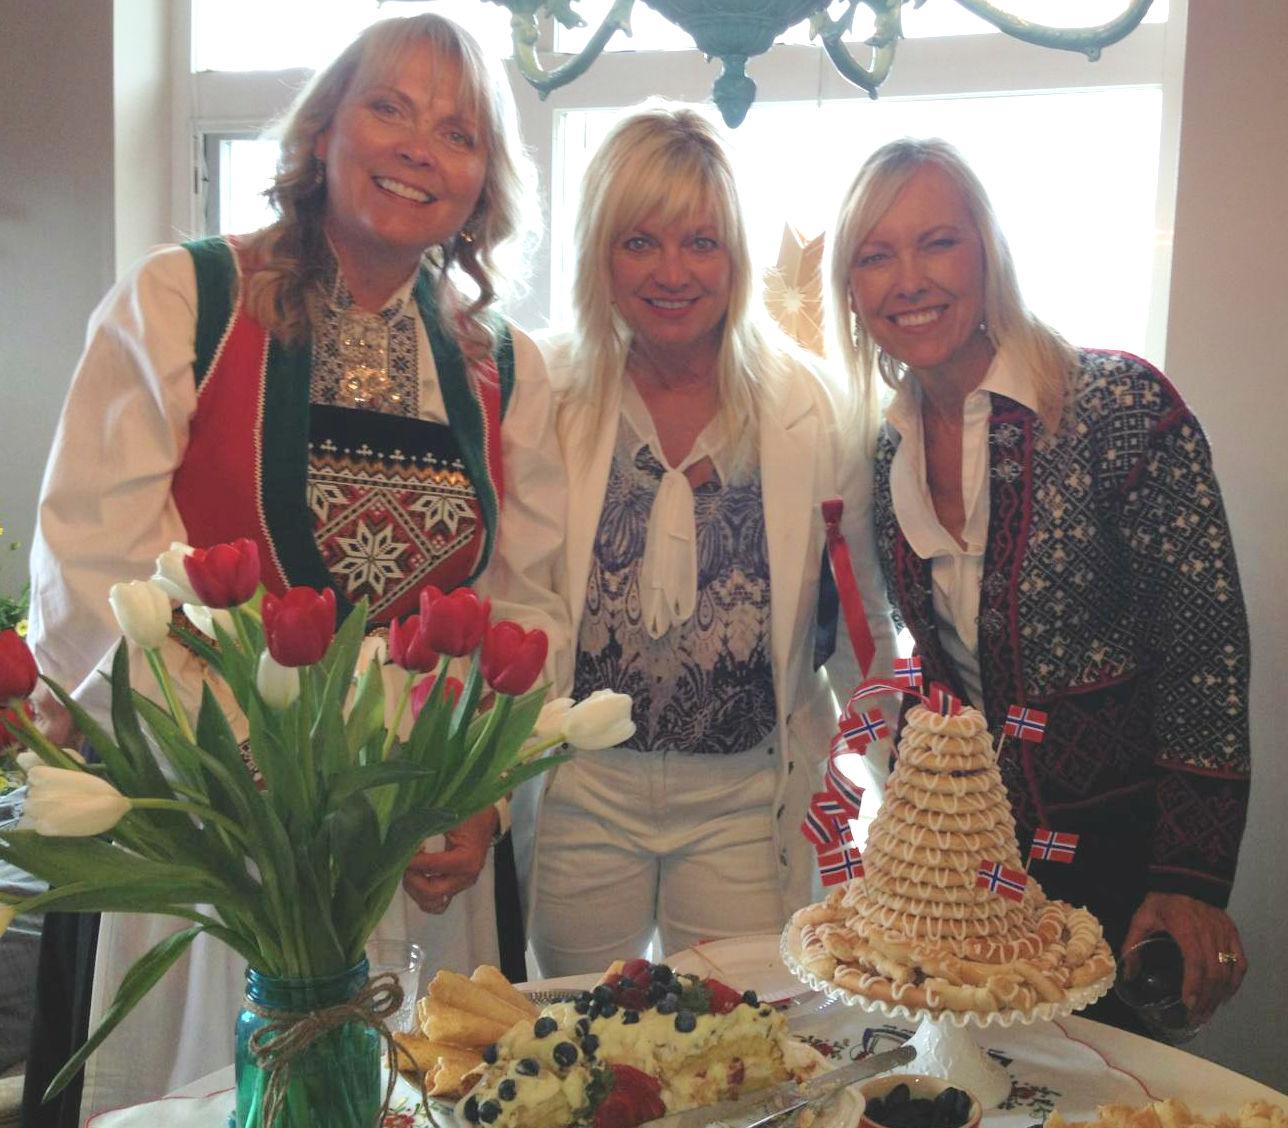 Linda (in Hardanger bunad), Norwegian friend Heidi, and me